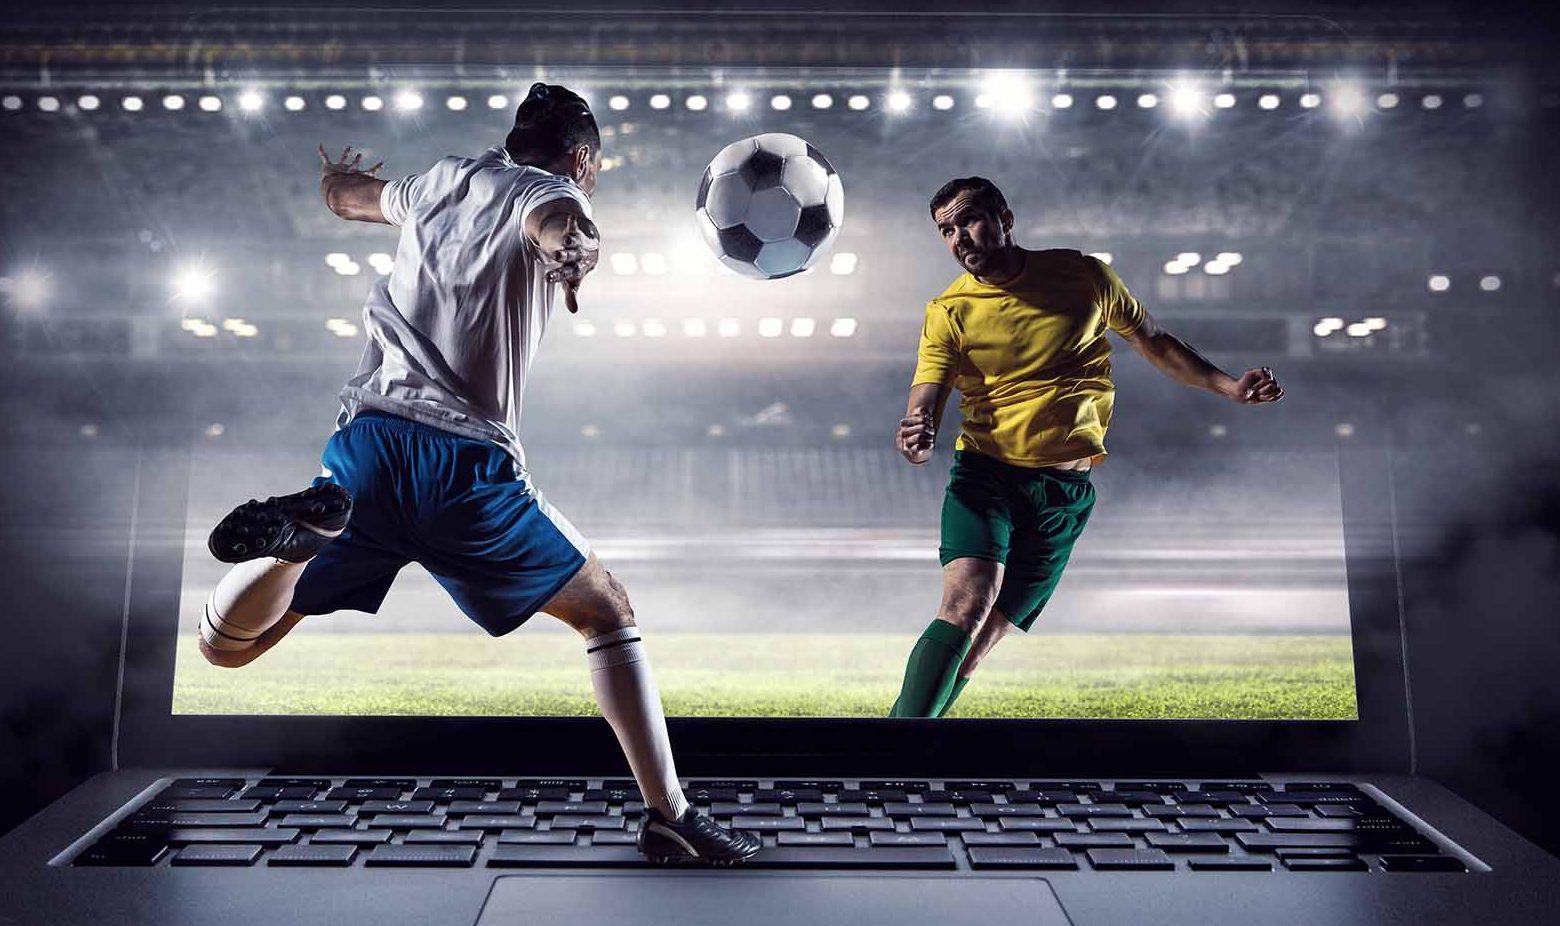 Расписание онлайн трансляций по футболу